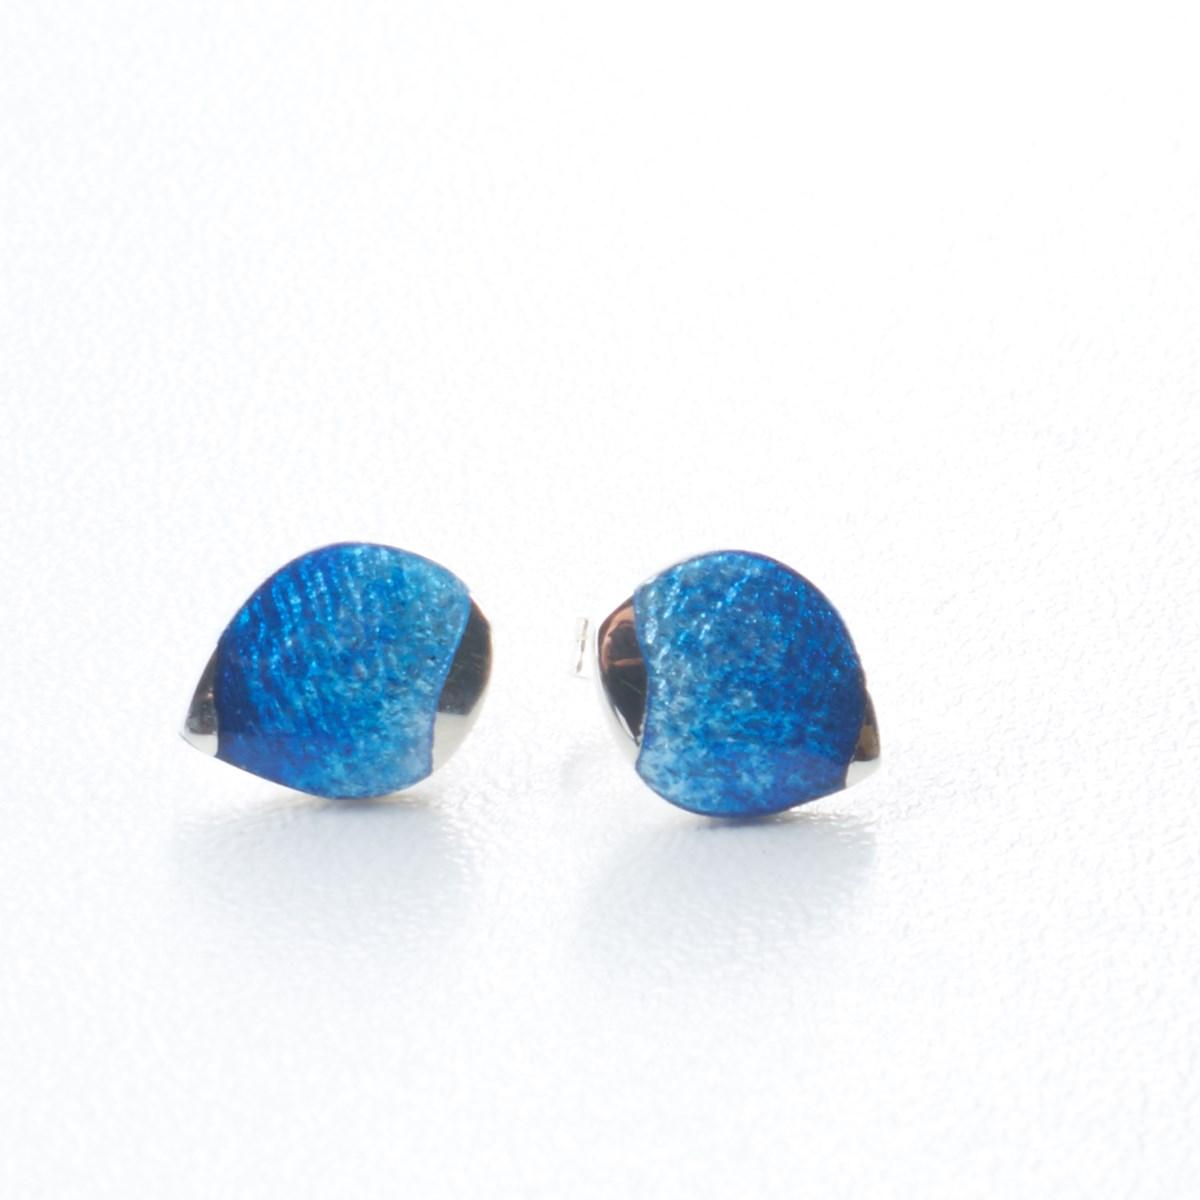 96910f3c9 Sterling Silver Mirage Earrings in Oasis by Ortak - The Kilt Store